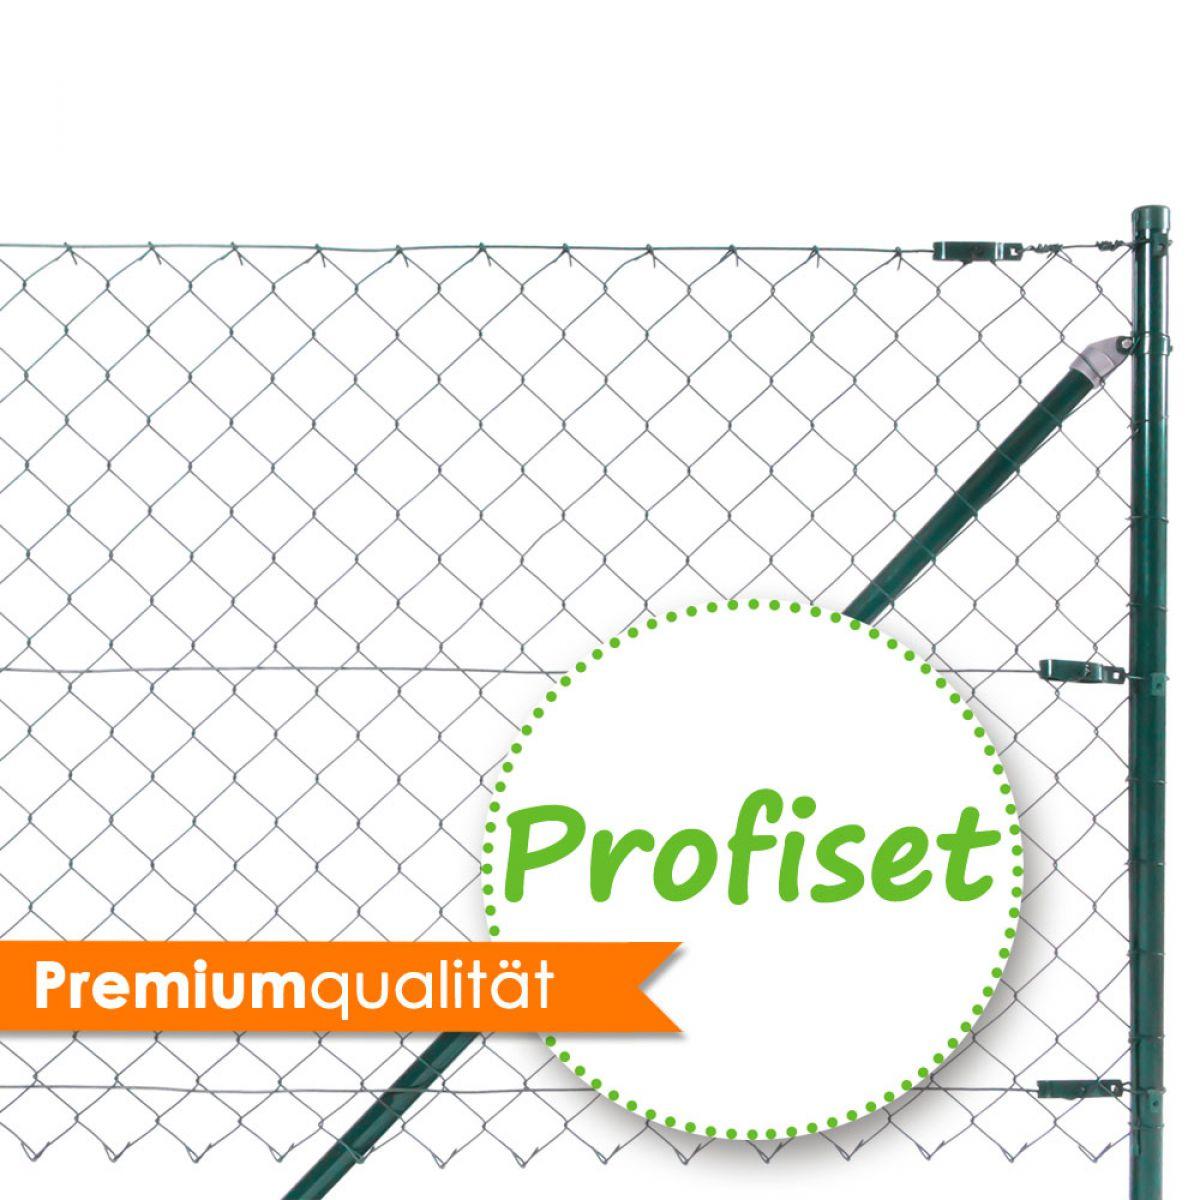 Zaun-Nagel - Maschendrahtzaun Komplettpaket Profiset